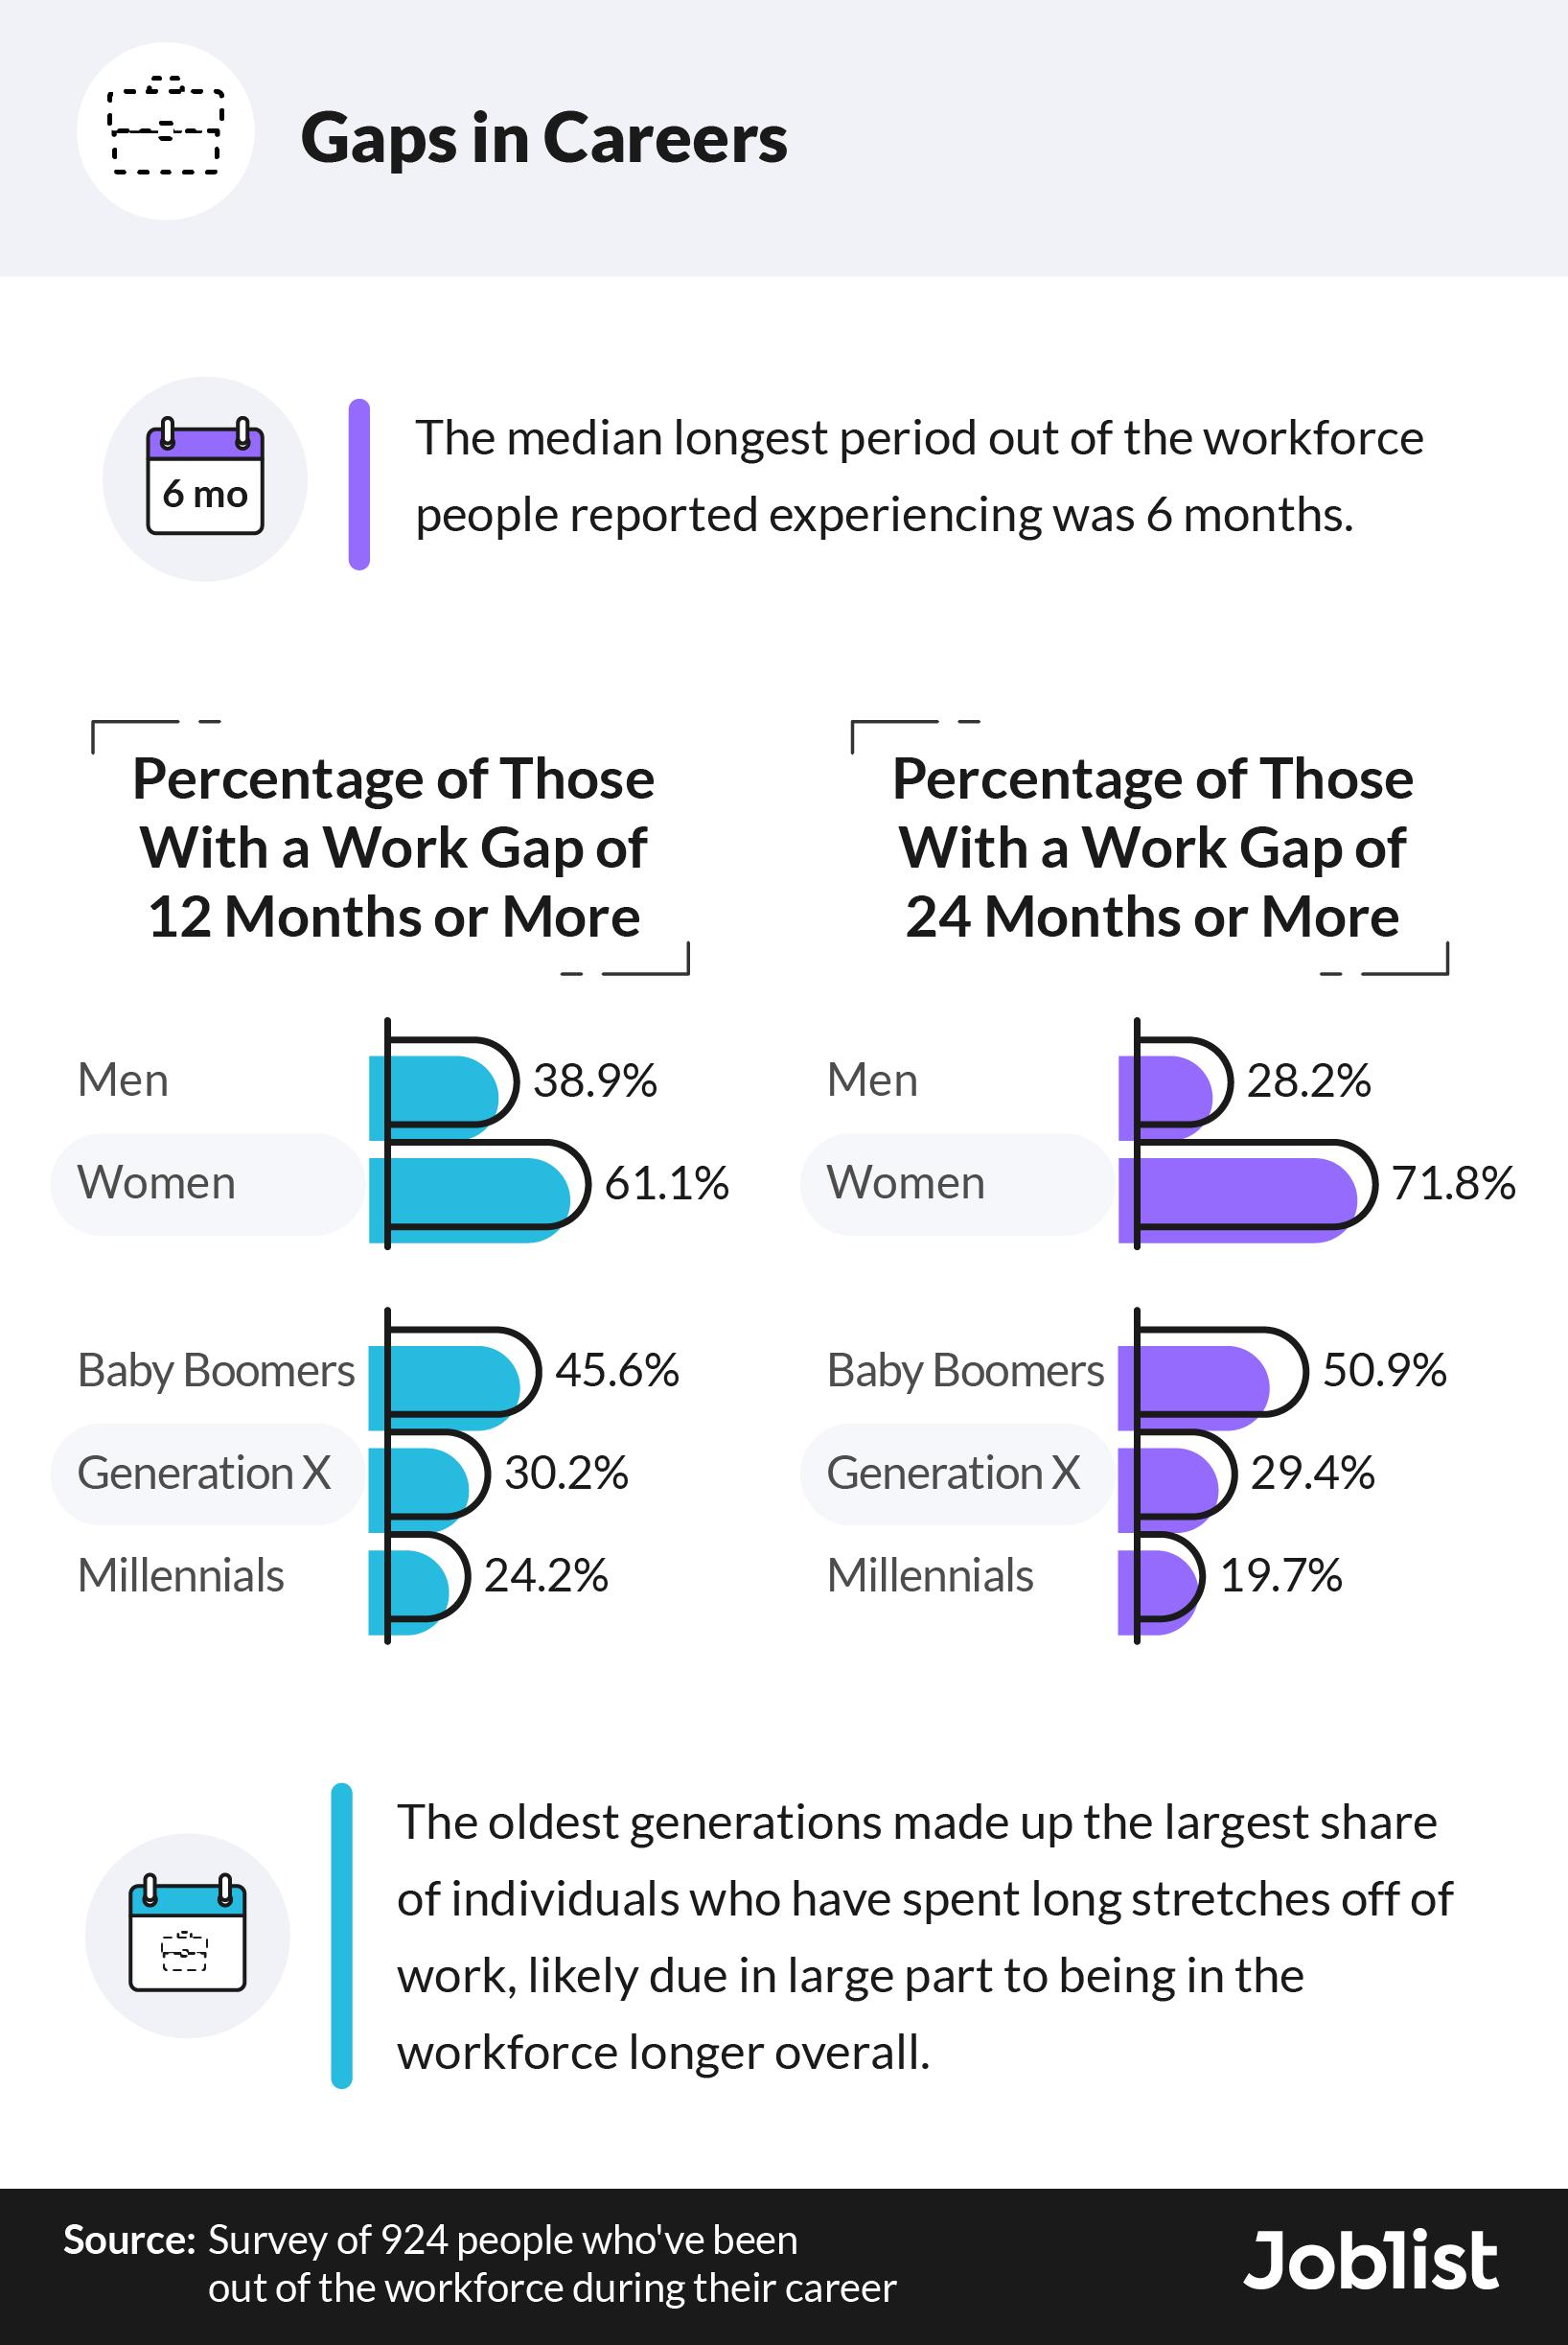 percentages-of-gaps-in-careers